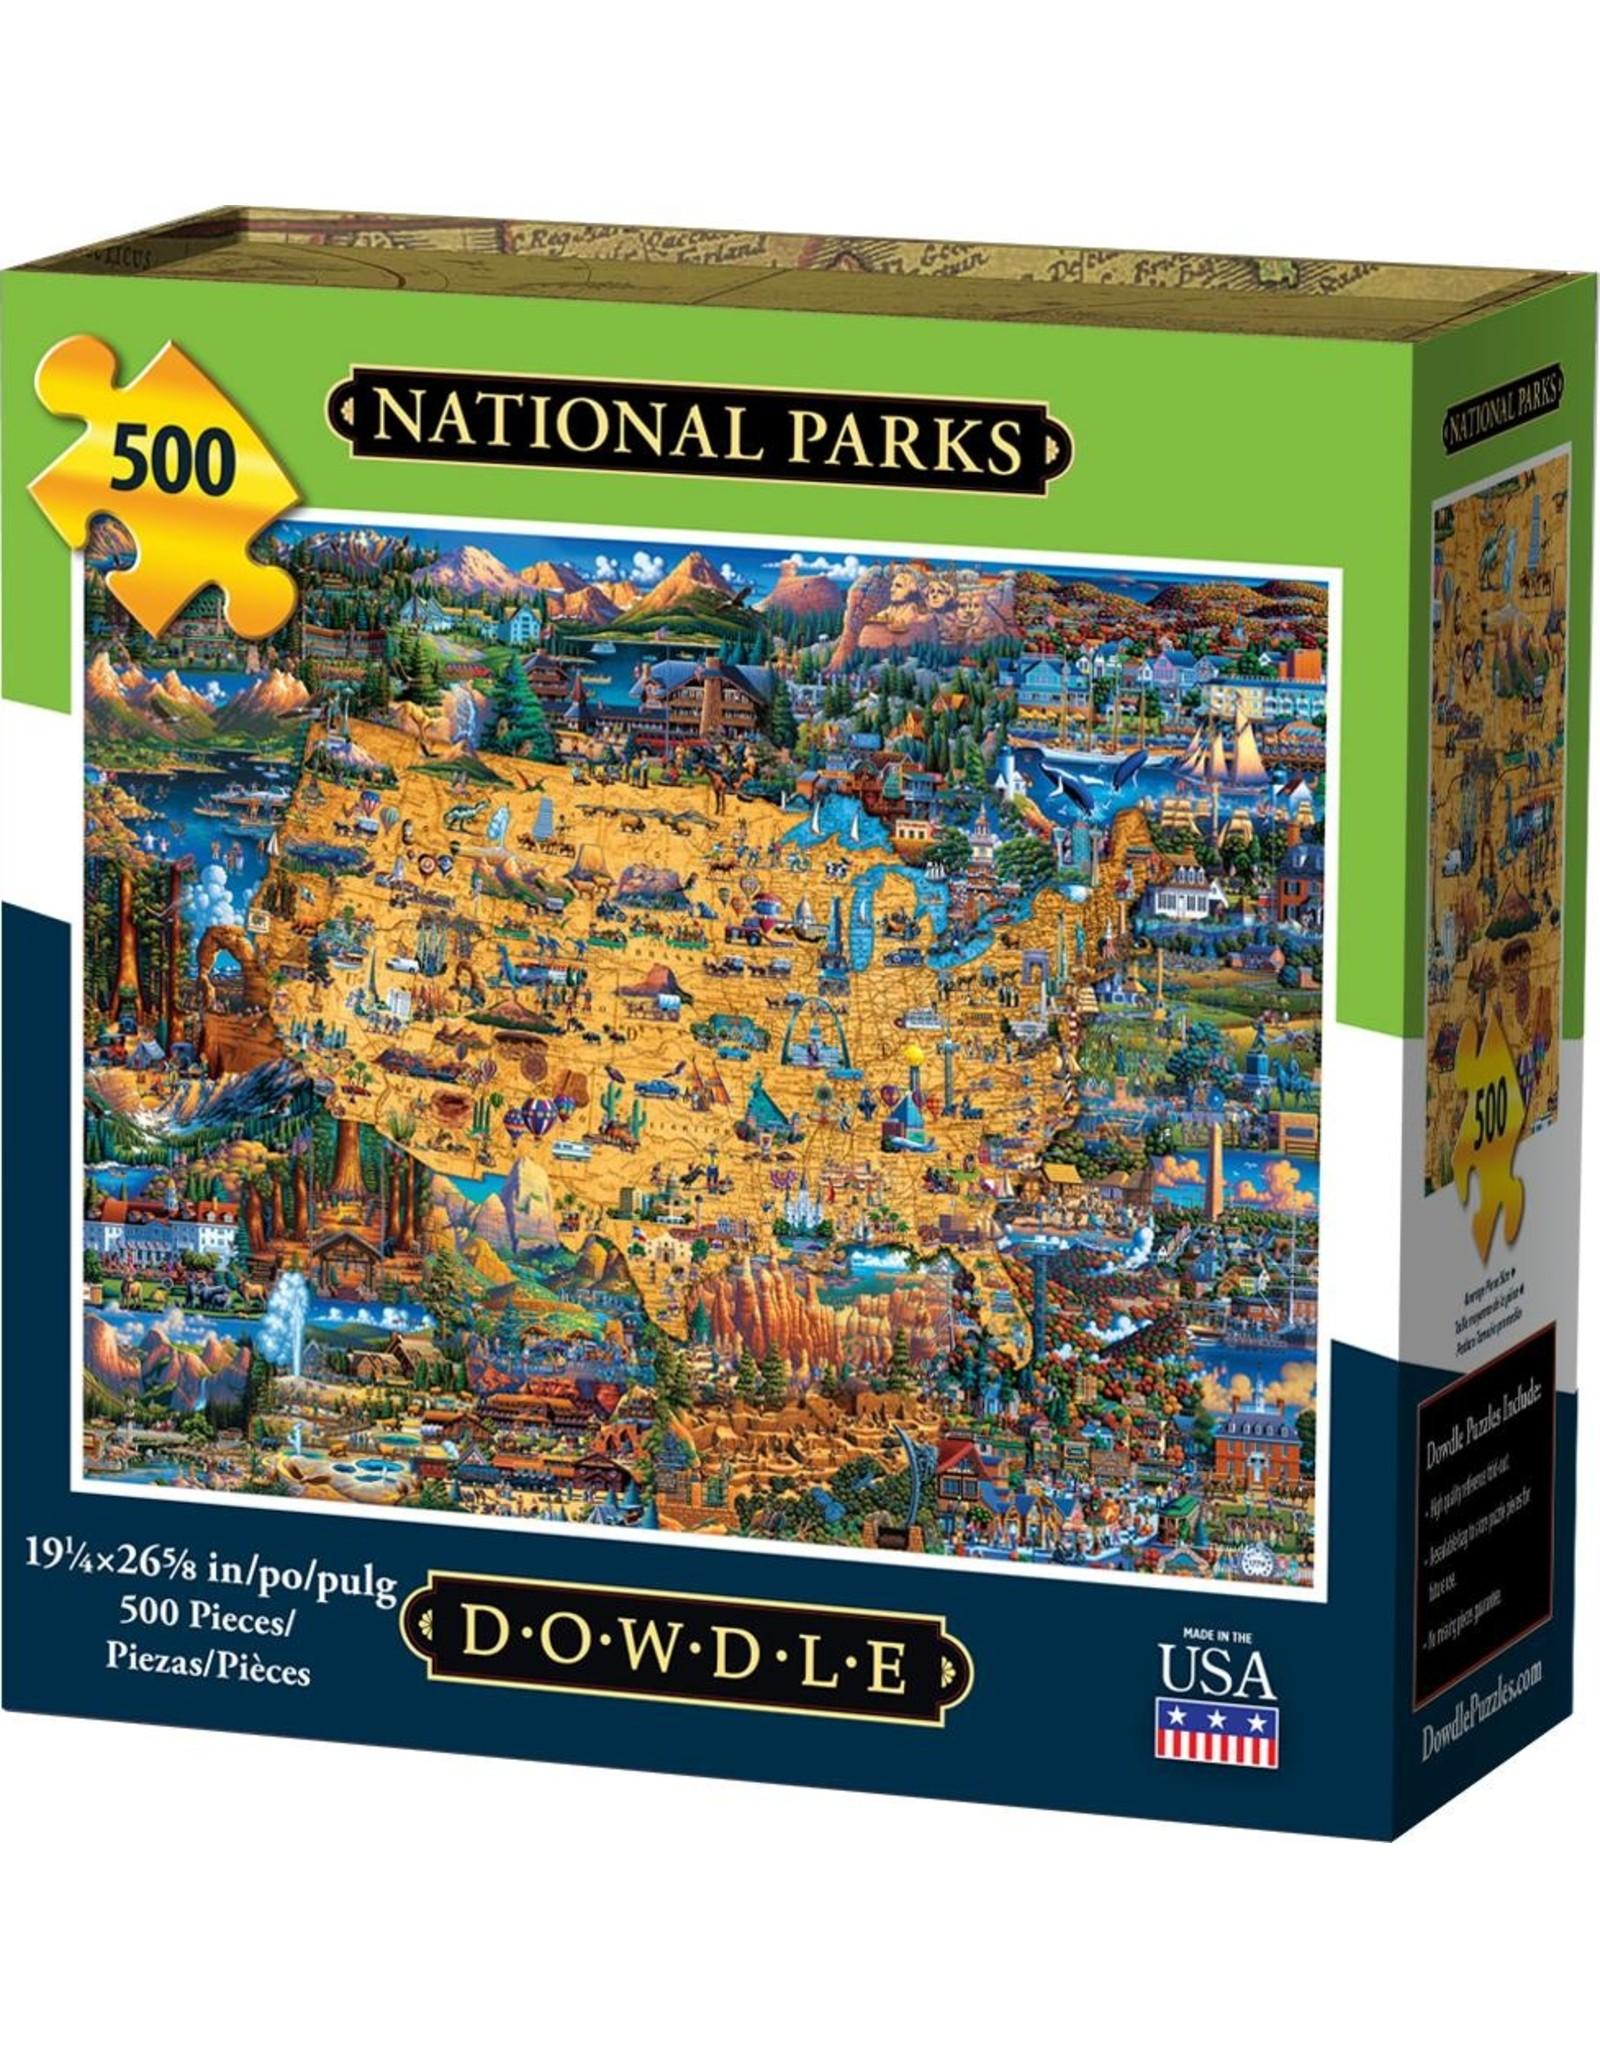 Dowdle Folkart National Park Pzl 500